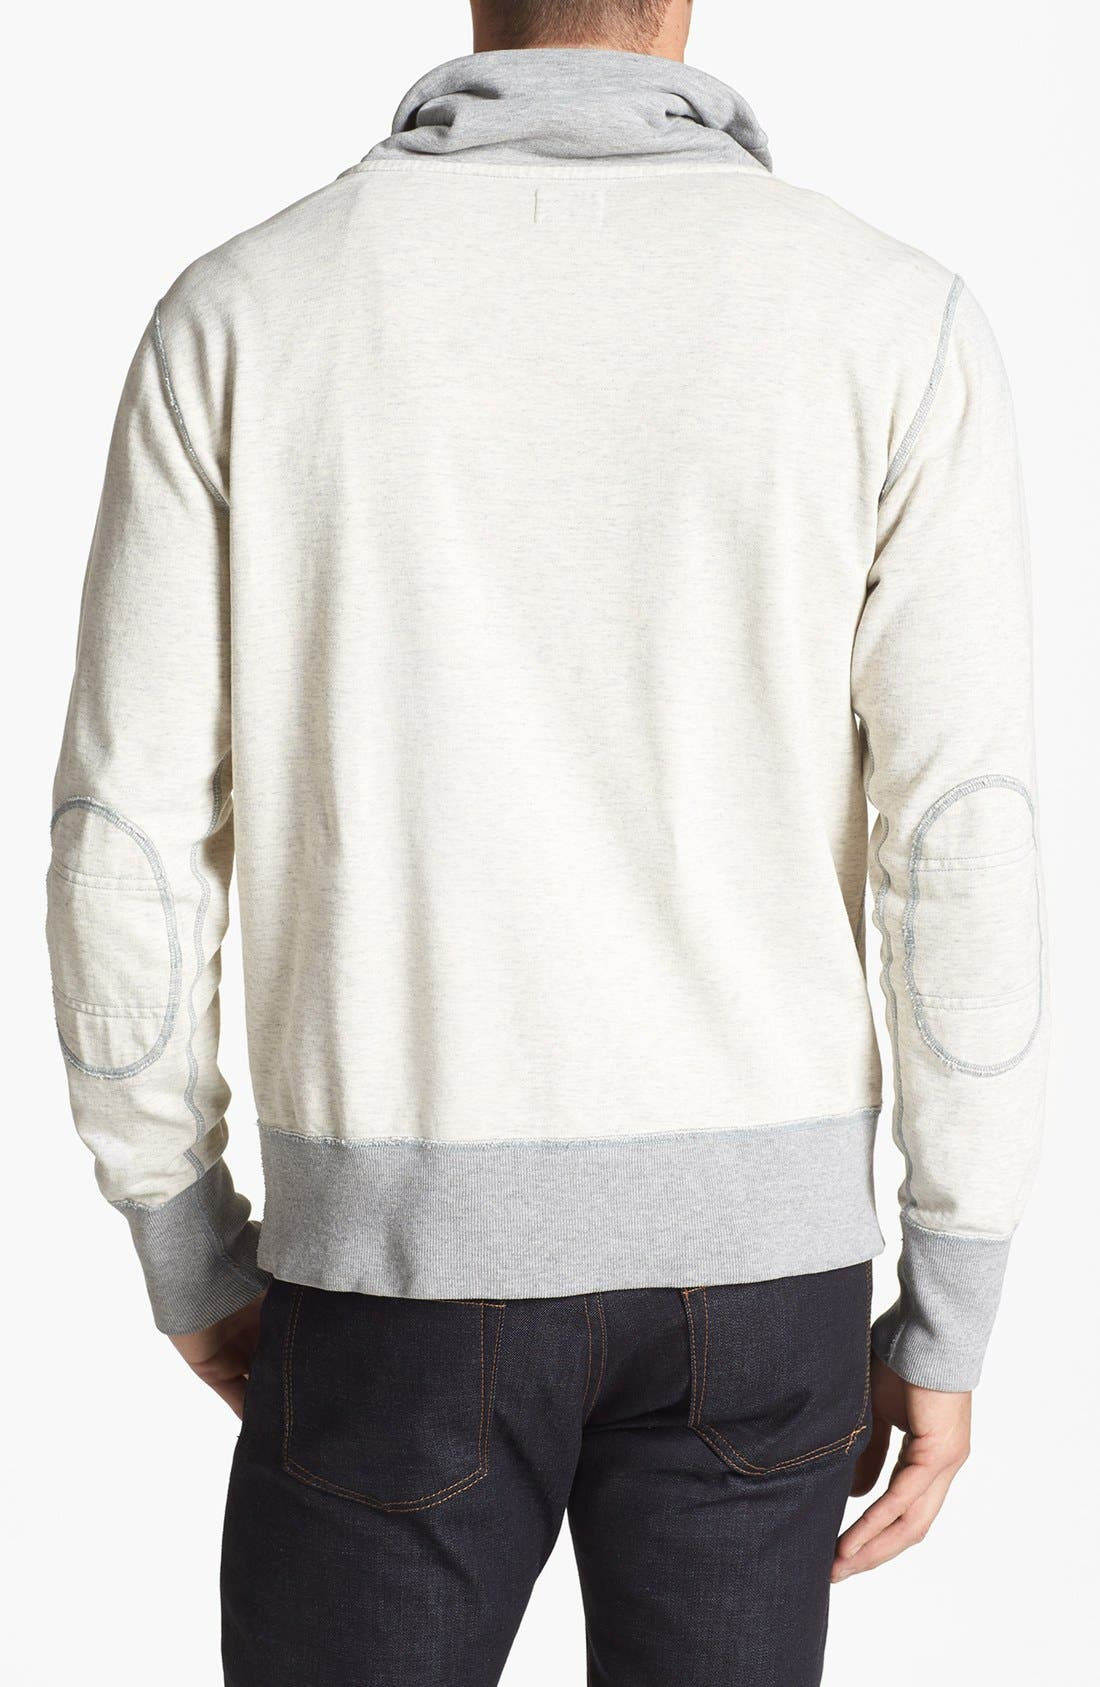 TODD SNYDER + CHAMPION, Shawl Collar Sweatshirt, Alternate thumbnail 3, color, 050